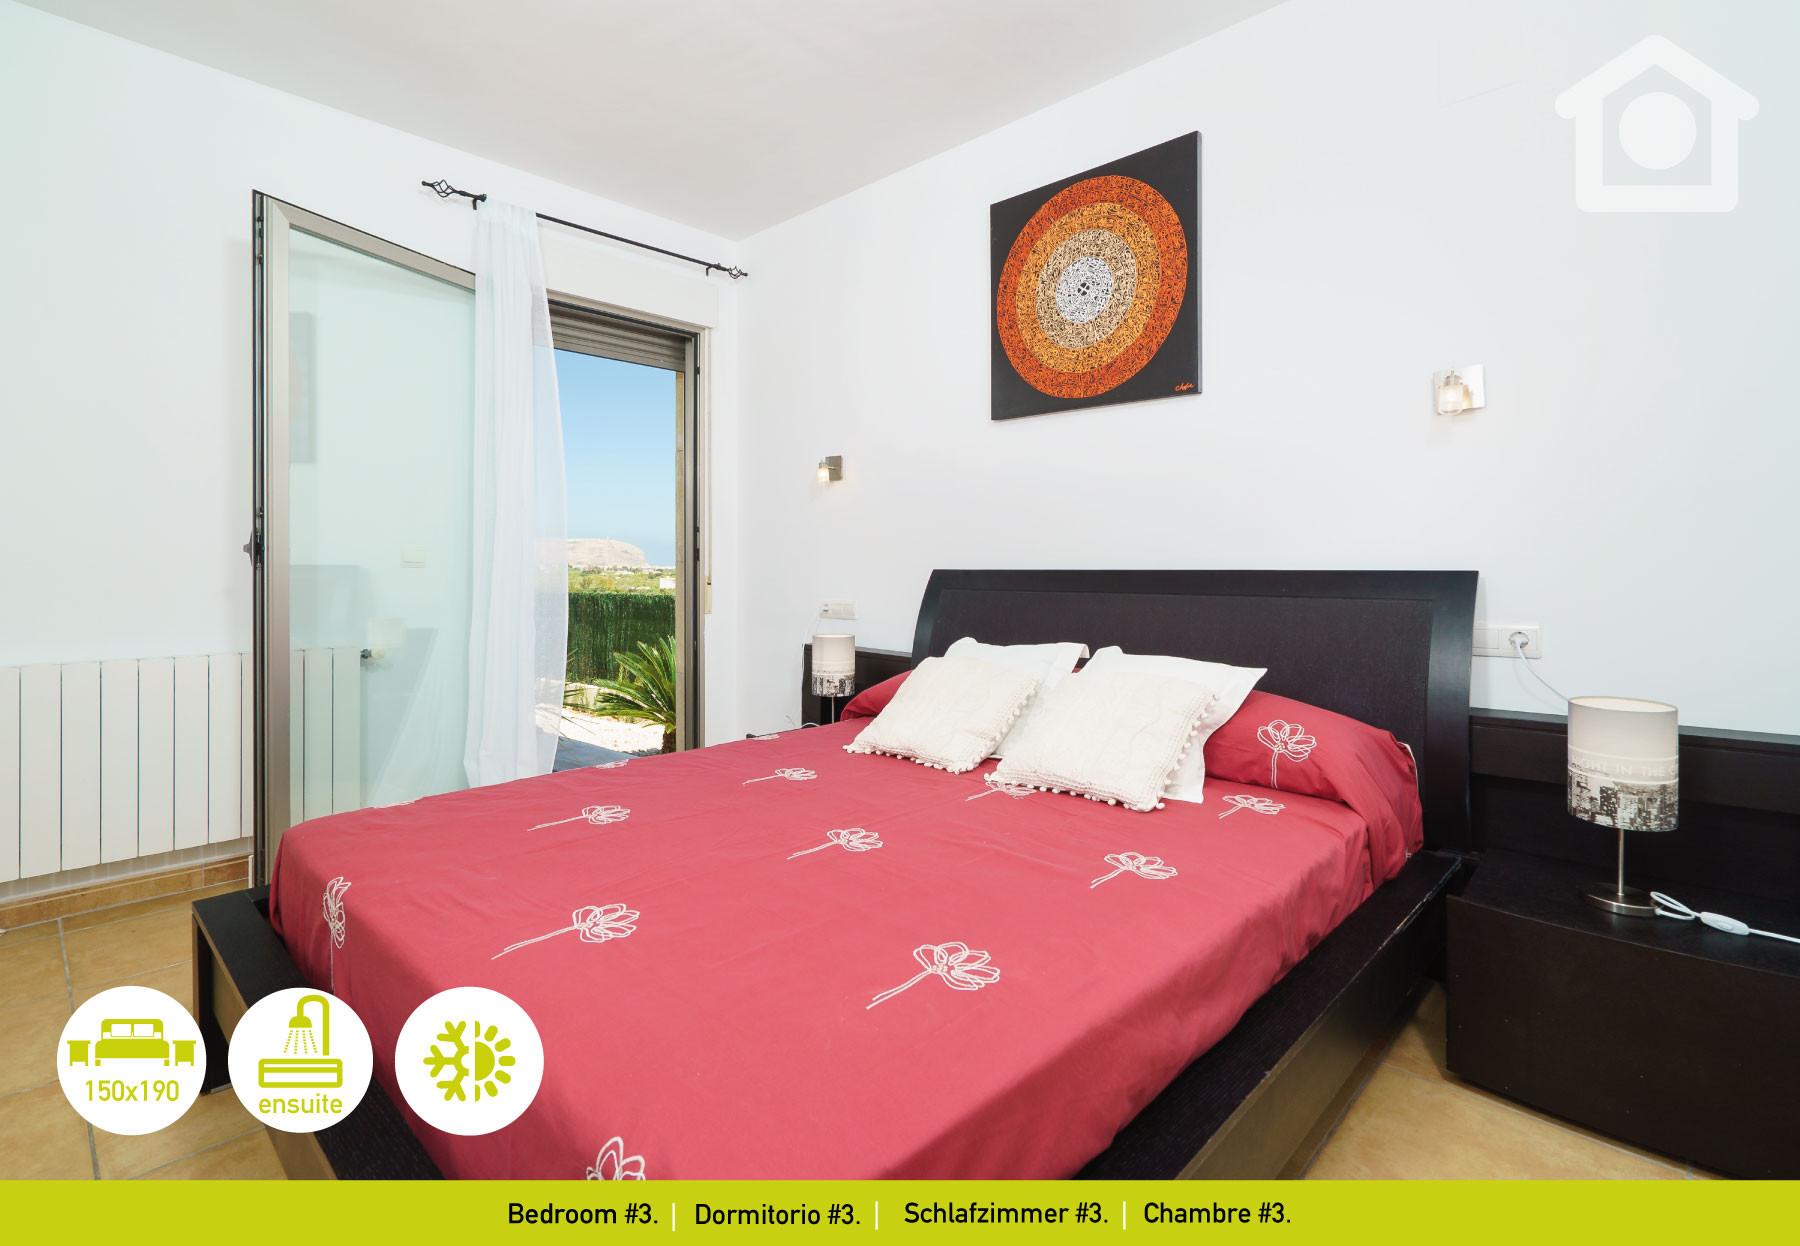 10 modern schlafzimmer bank designs, villas in javea / xàbia - solhabitat javea holidays, Design ideen